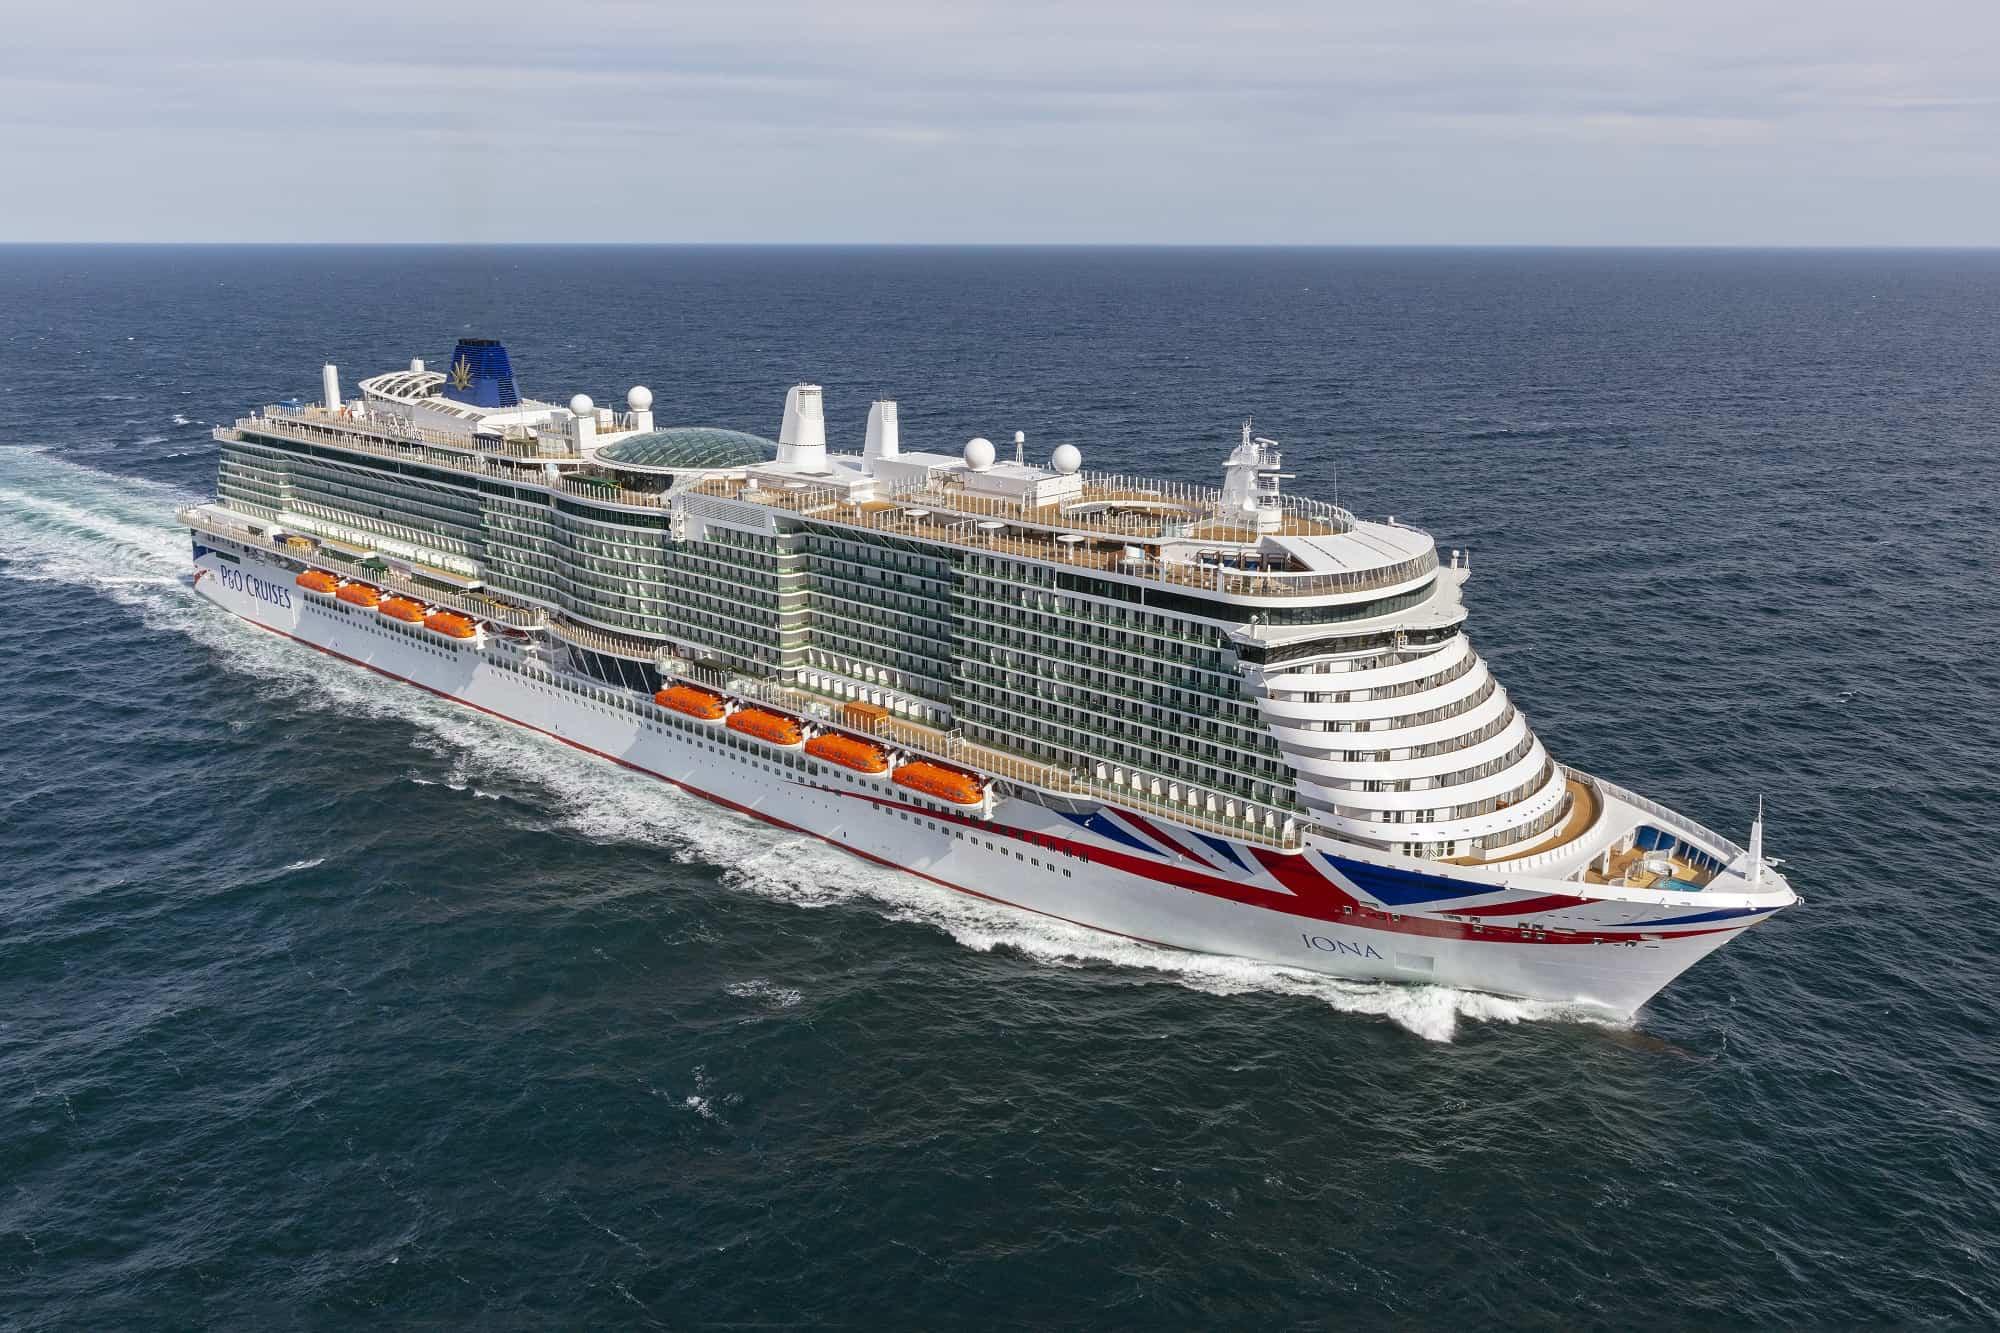 P&O Cruises iona excellence class